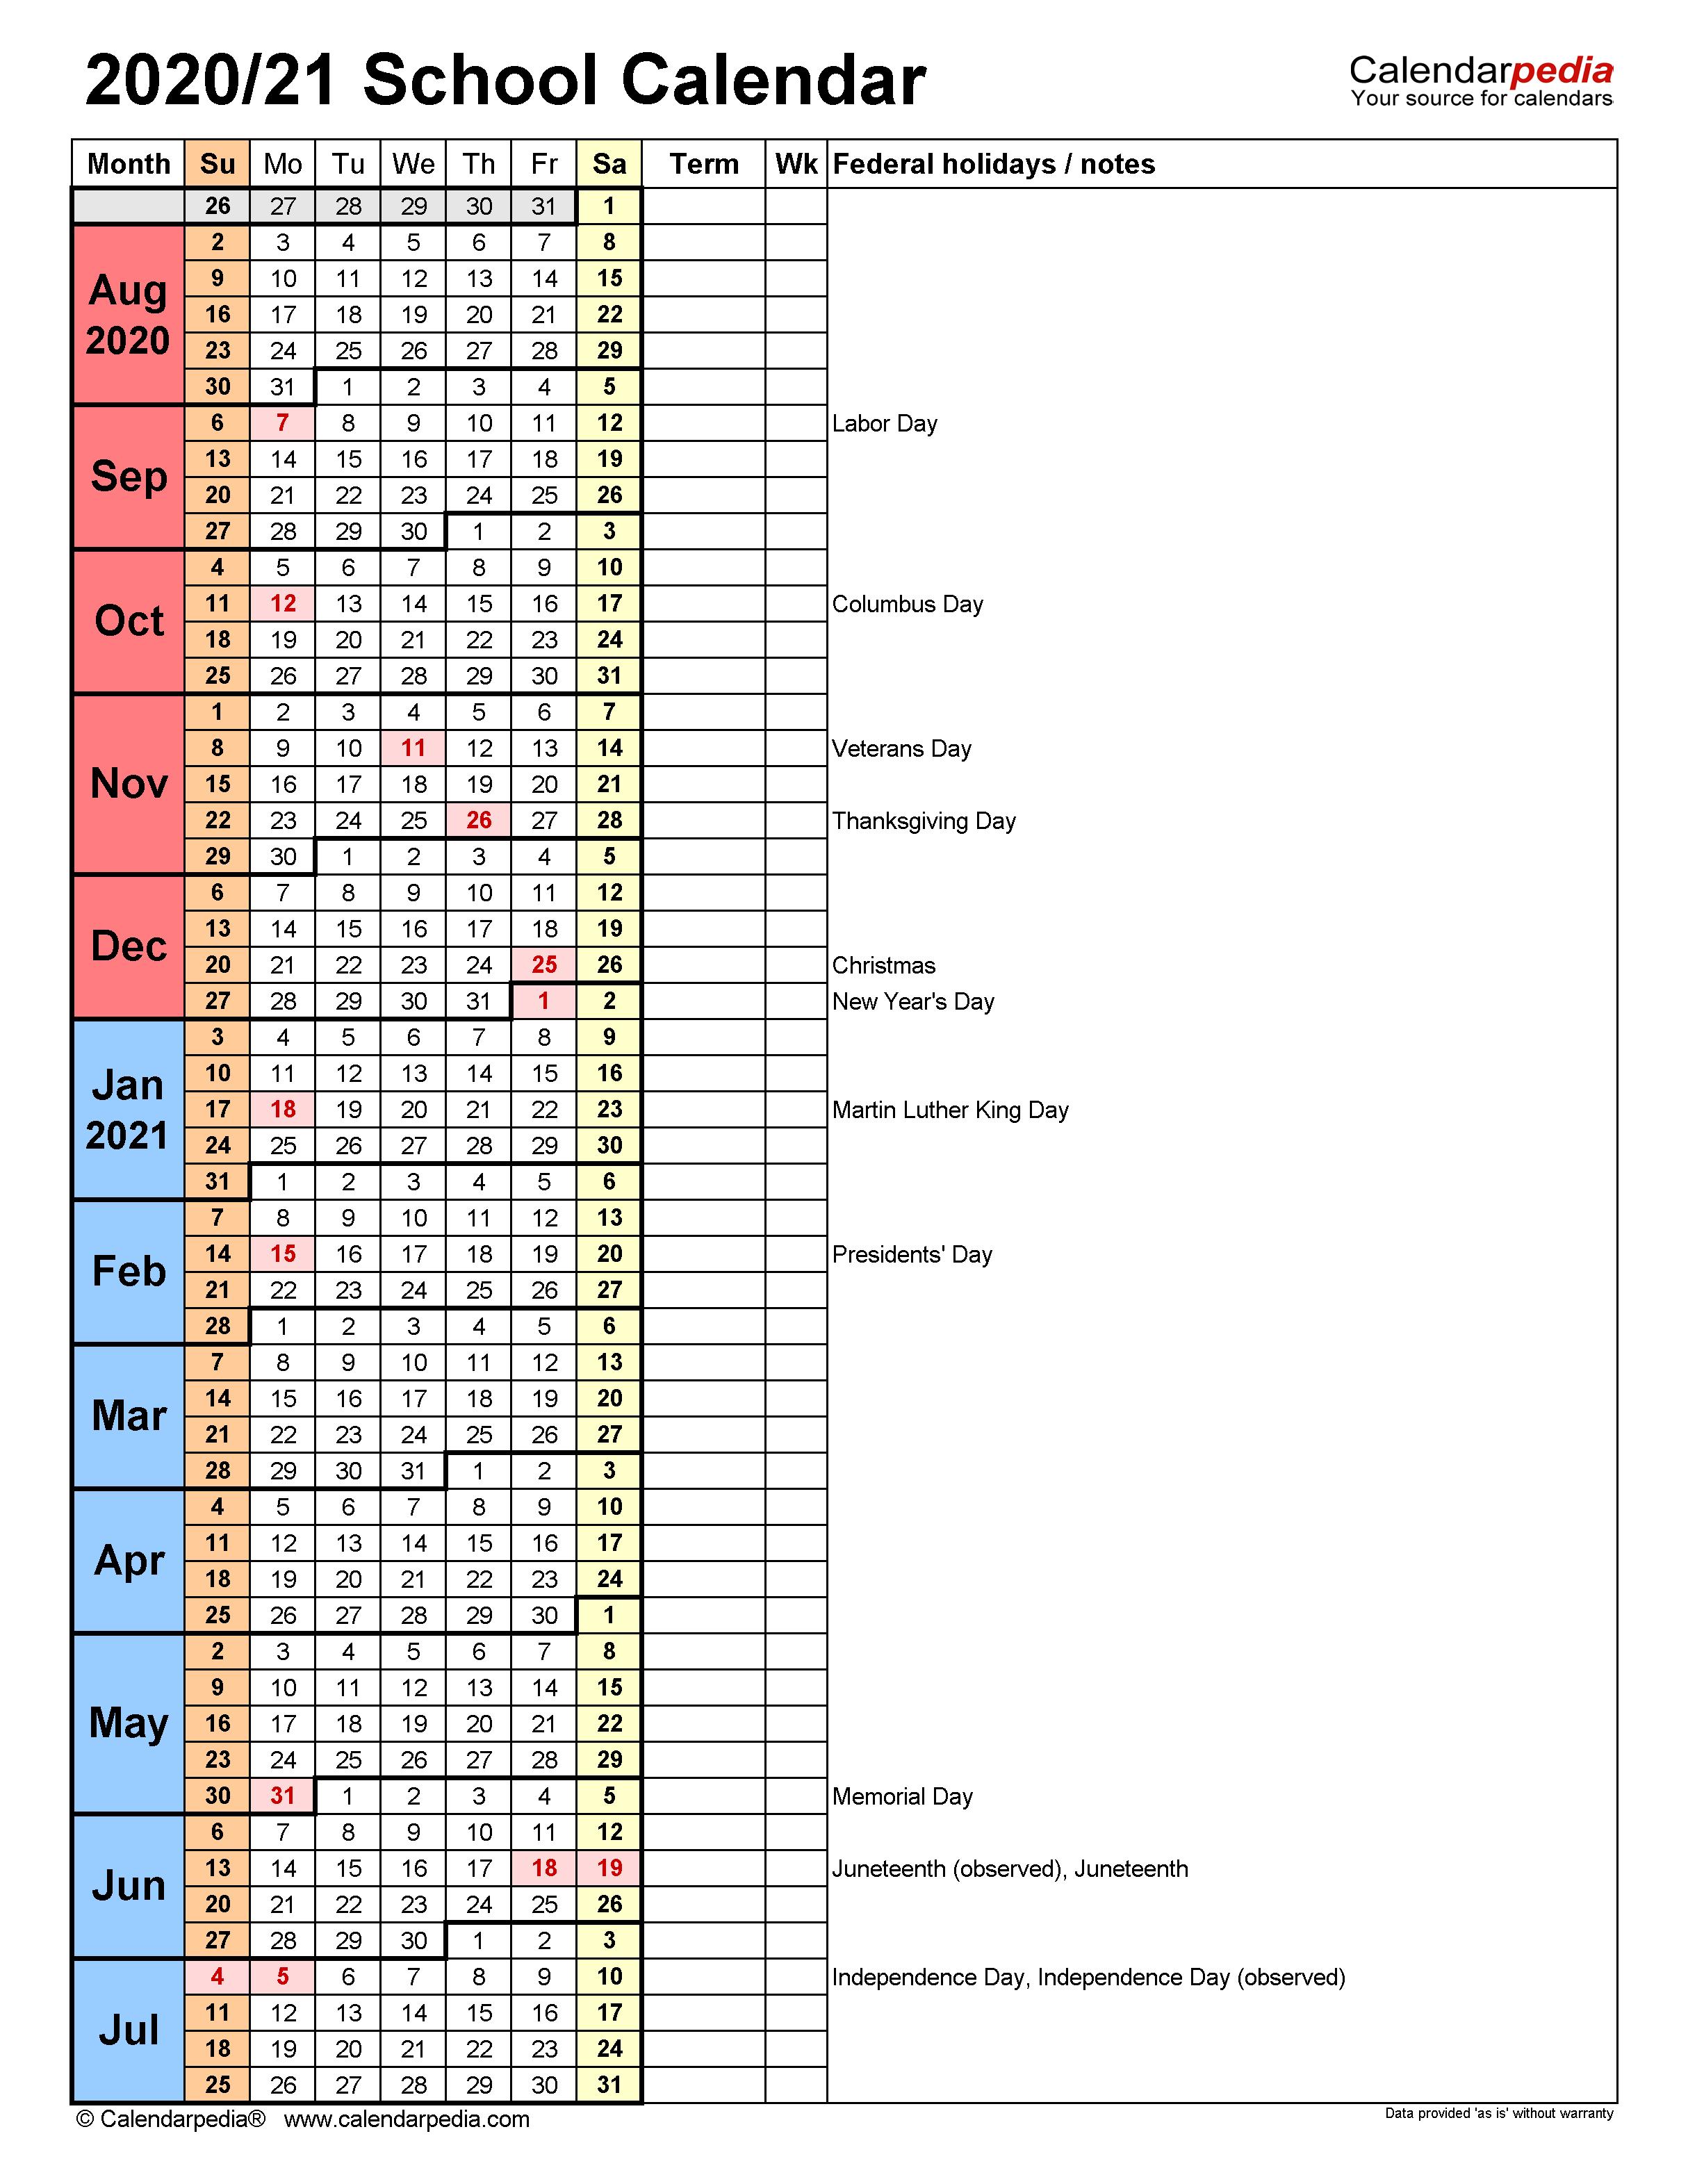 Nyc Doe 2022 23 Calendar.School Calendars 2020 2021 Free Printable Word Templates